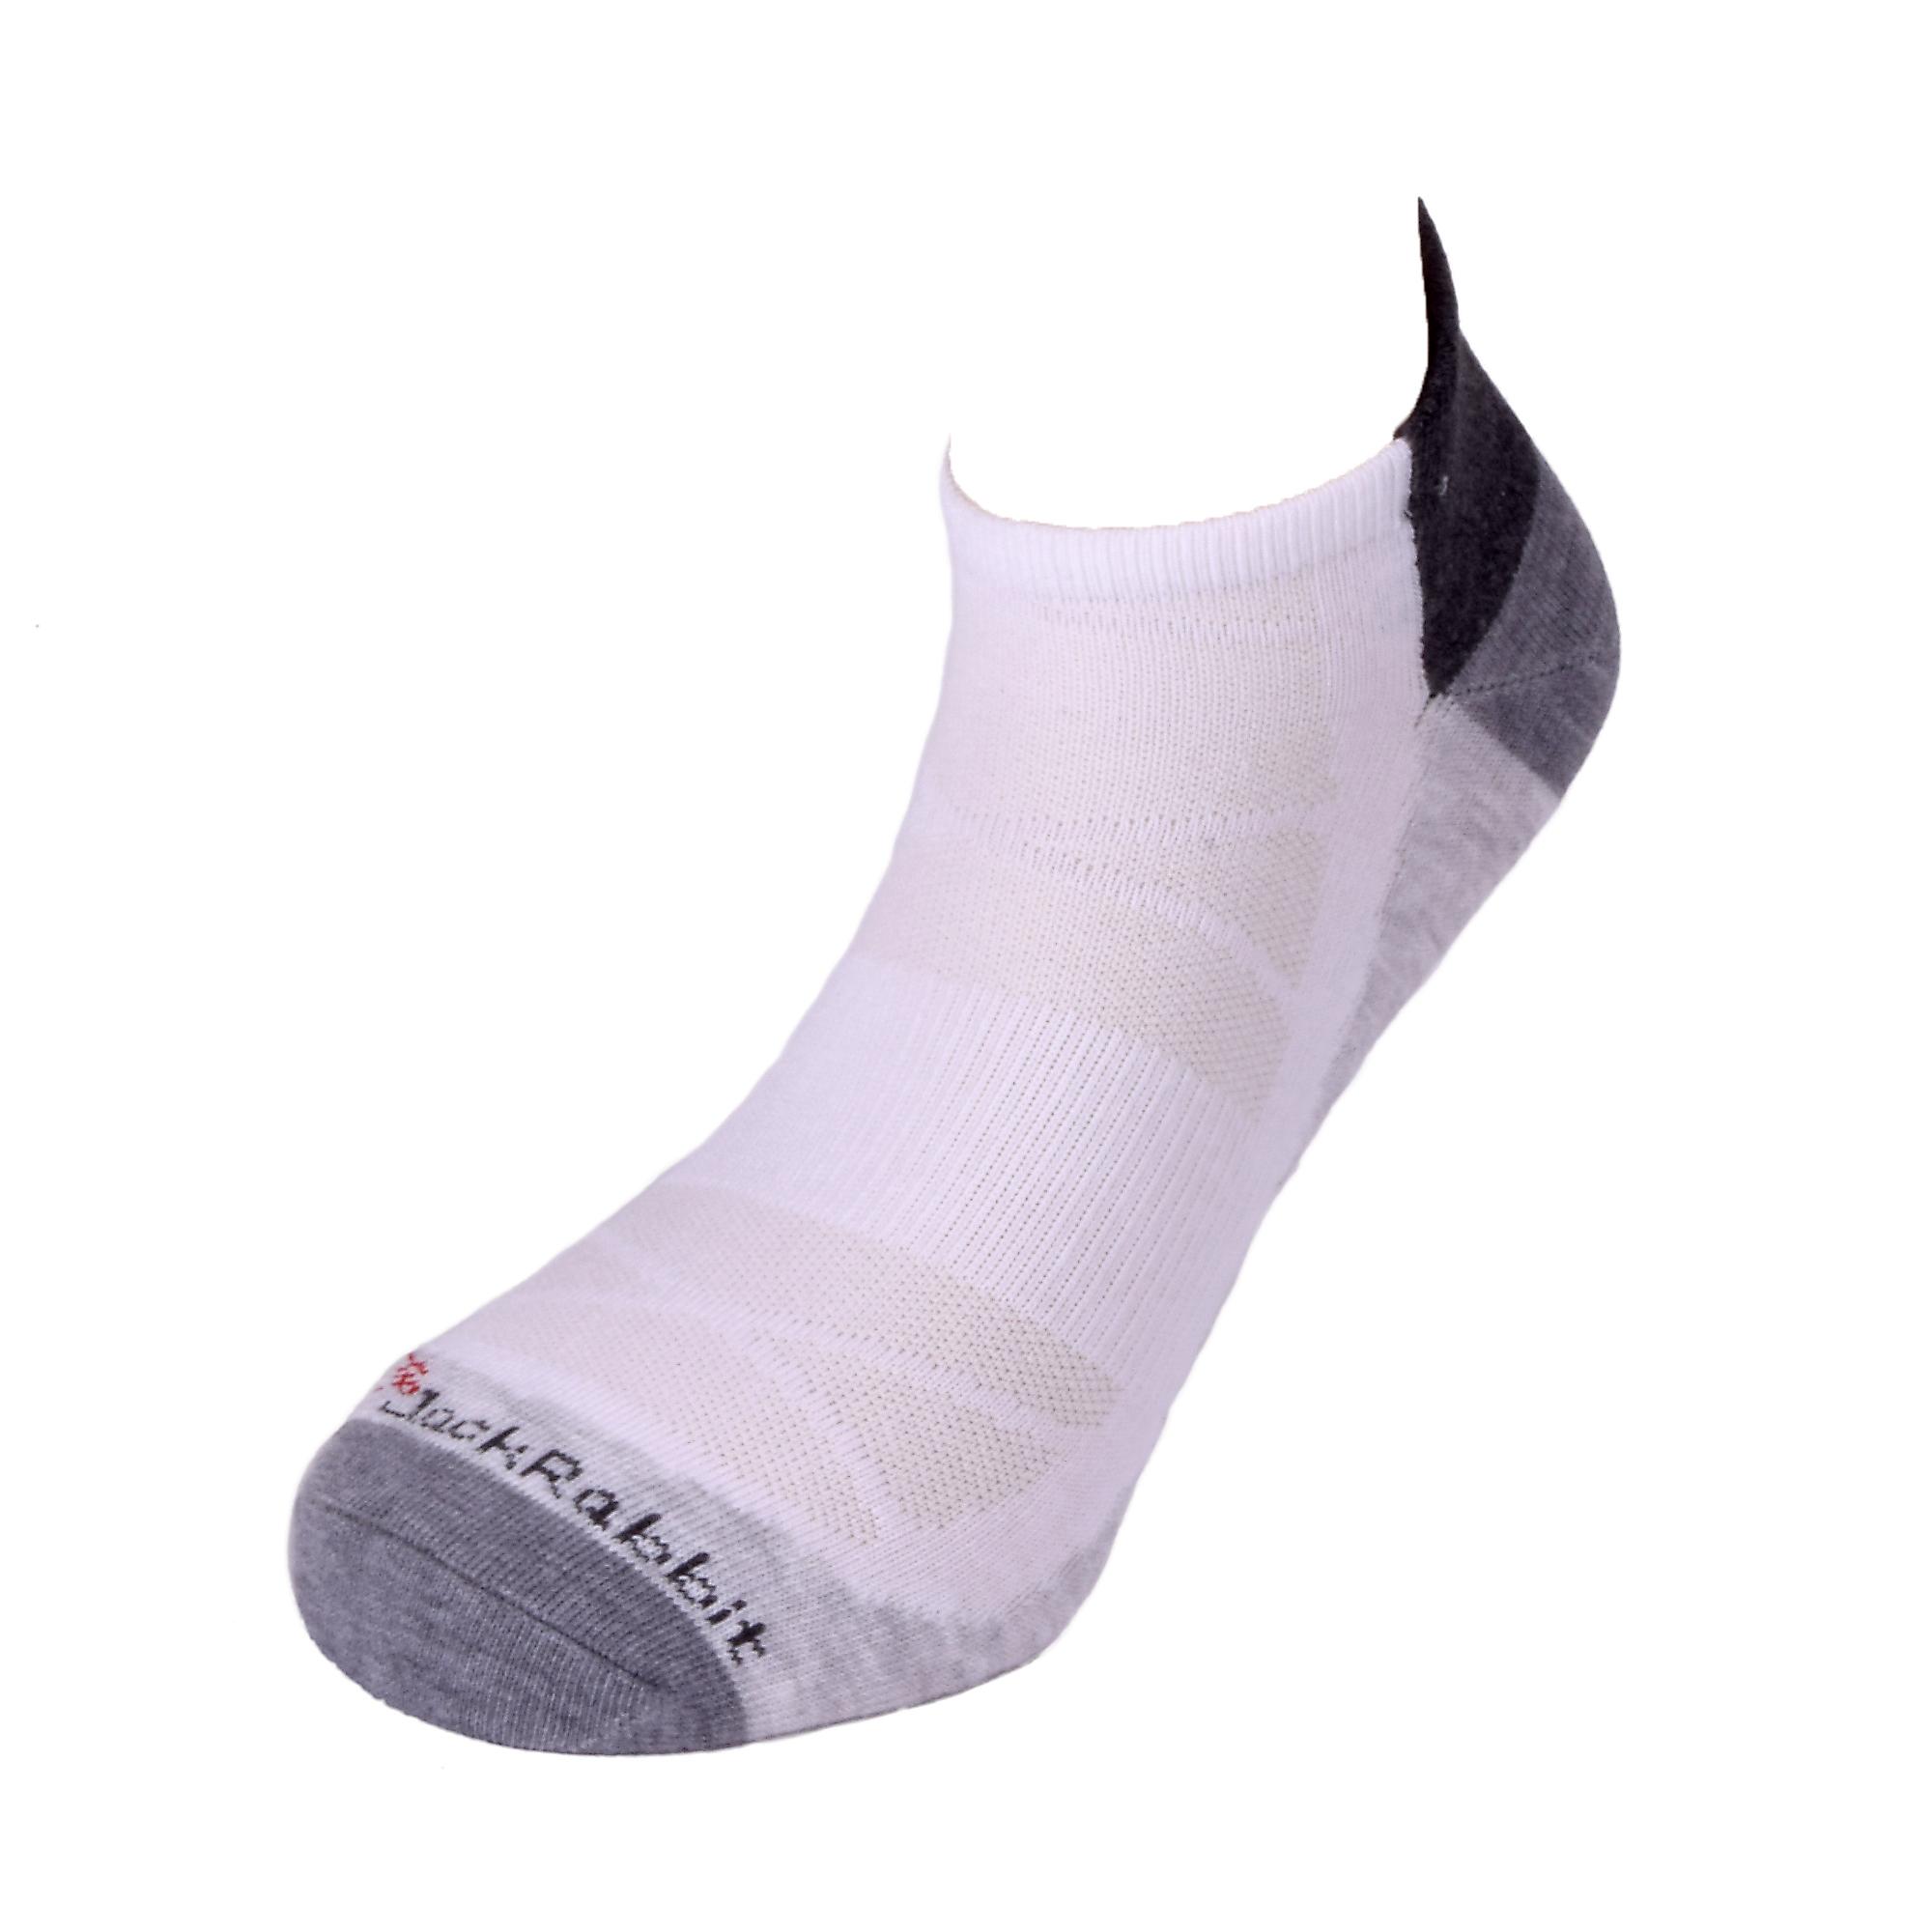 JackRabbit No Show Tab Lite Performance Running Sock - Color: White - Size: S, White/Grey, large, image 2